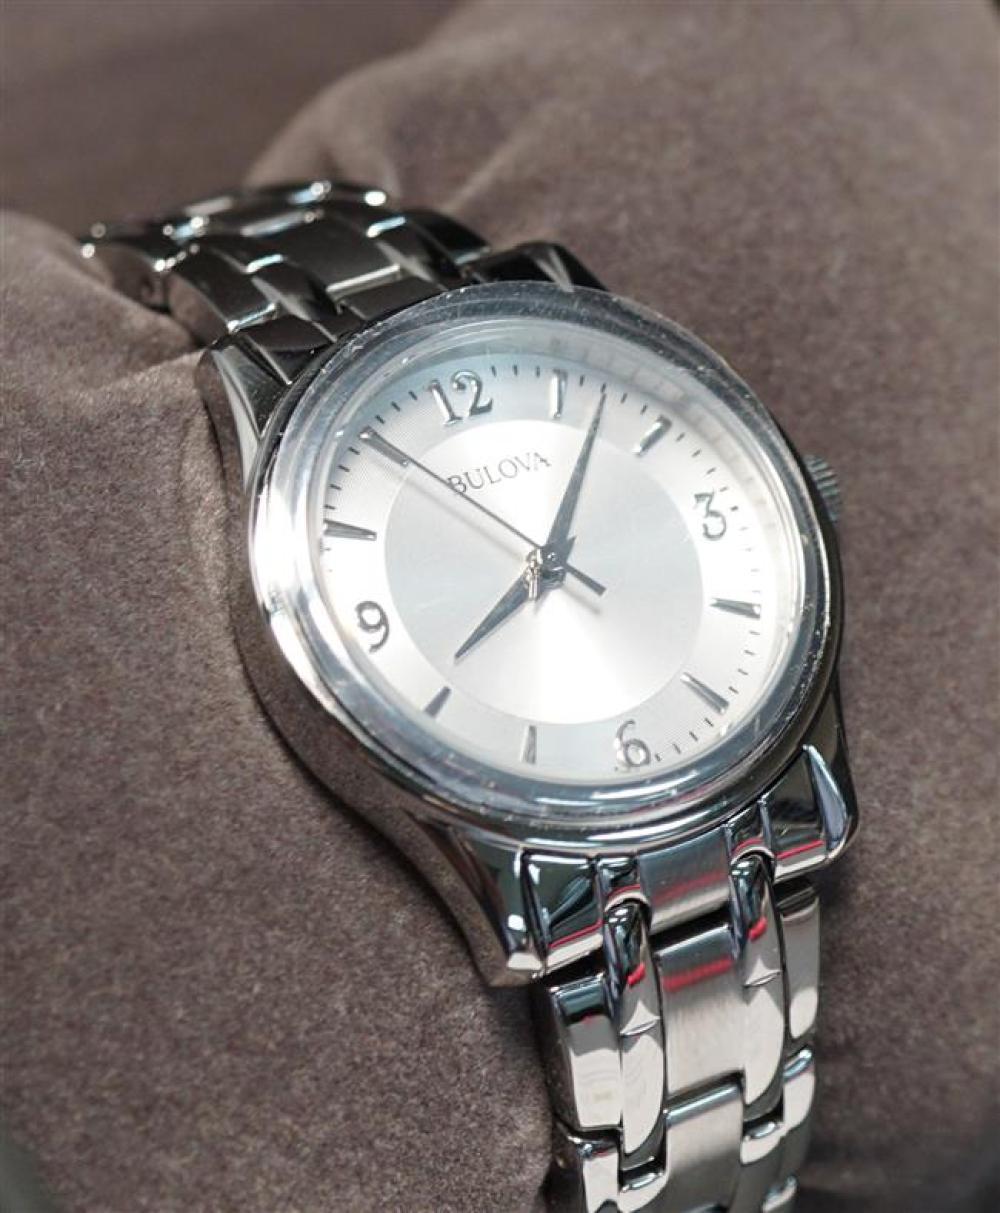 Bulova Stainless Steel Quartz Wristwatch with Original Box, Diameter: 30 mm; Length: 6-3/4 in